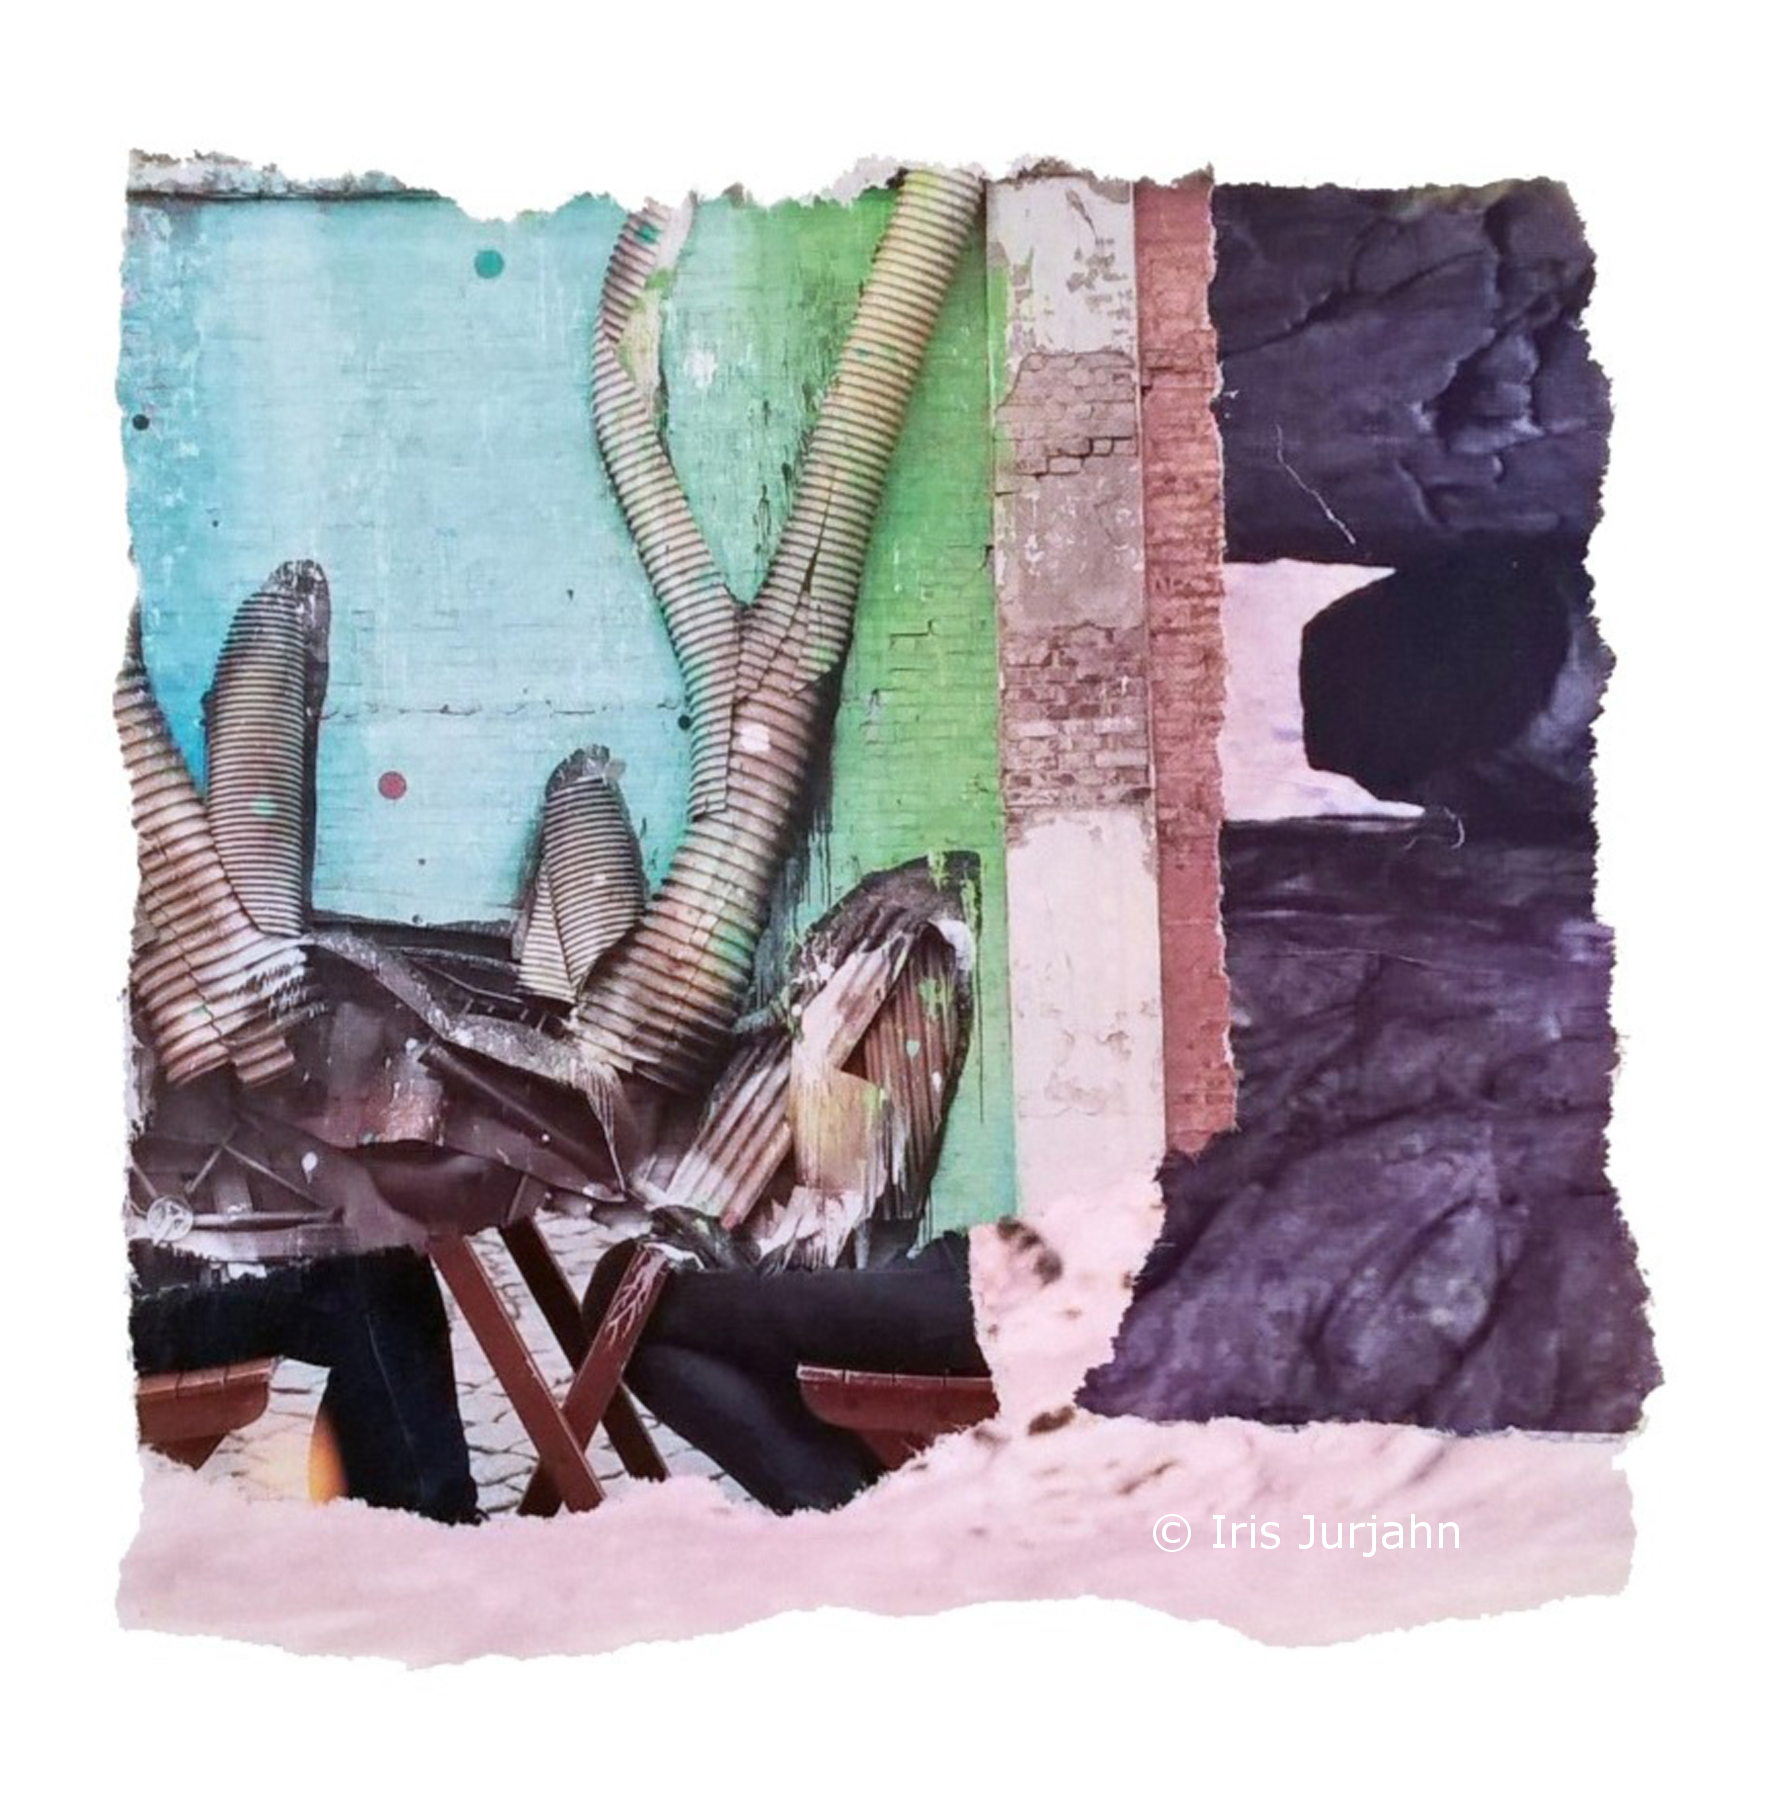 My deer, Papiercollage, 17,5 x 17,5 cm, 2017 - sold